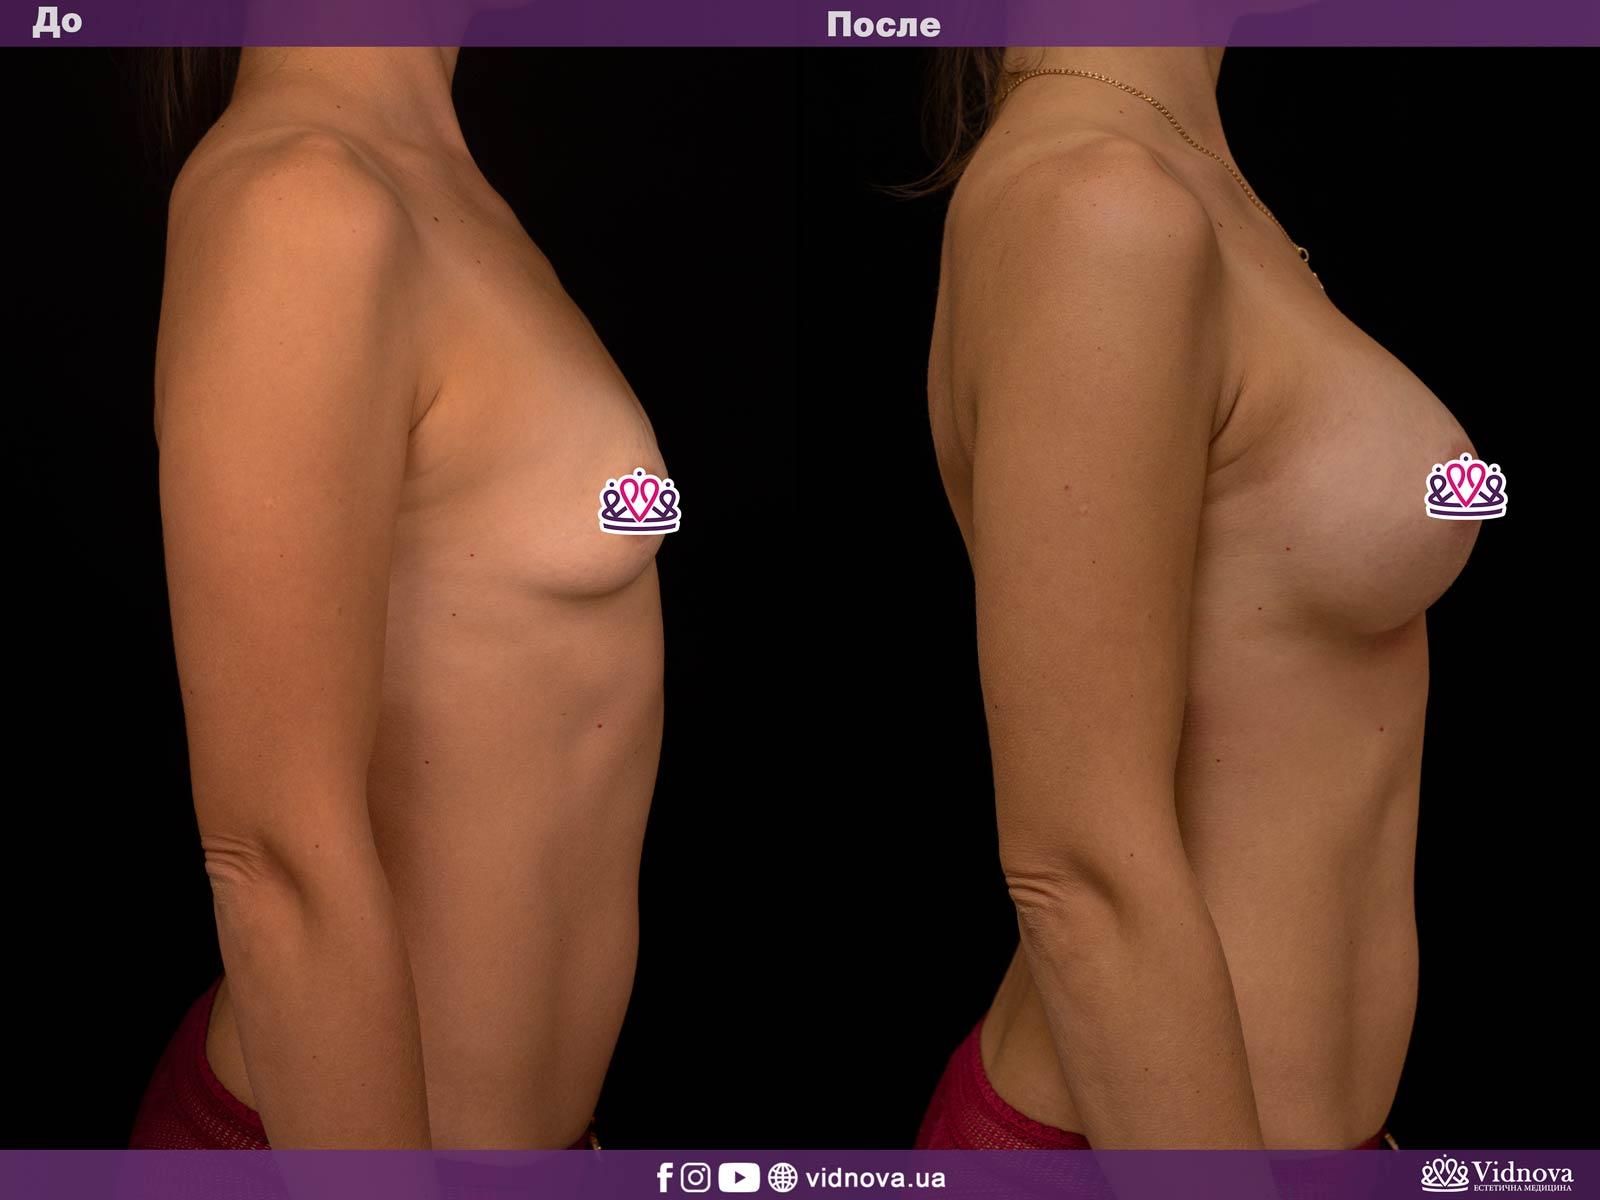 Увеличение груди: Фото ДО и ПОСЛЕ - Пример №11-3 - Клиника Vidnova